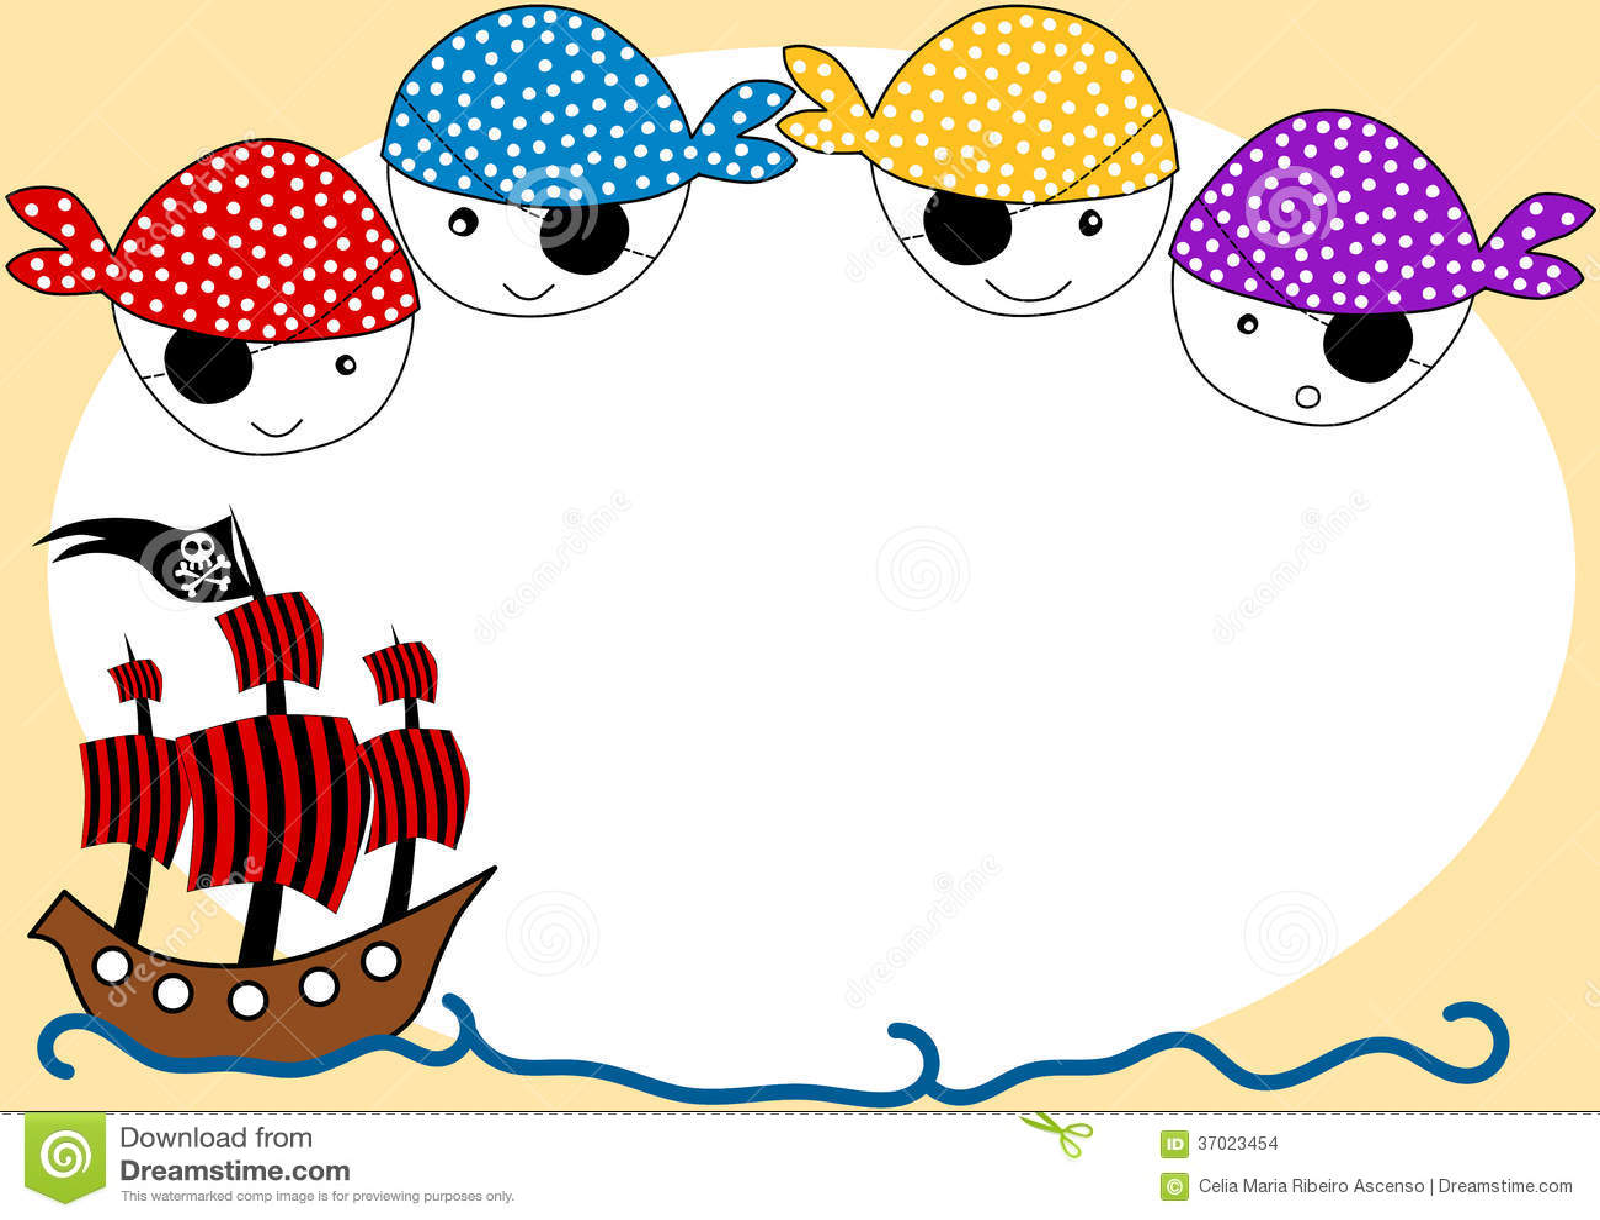 Clip Art Baby Pirate